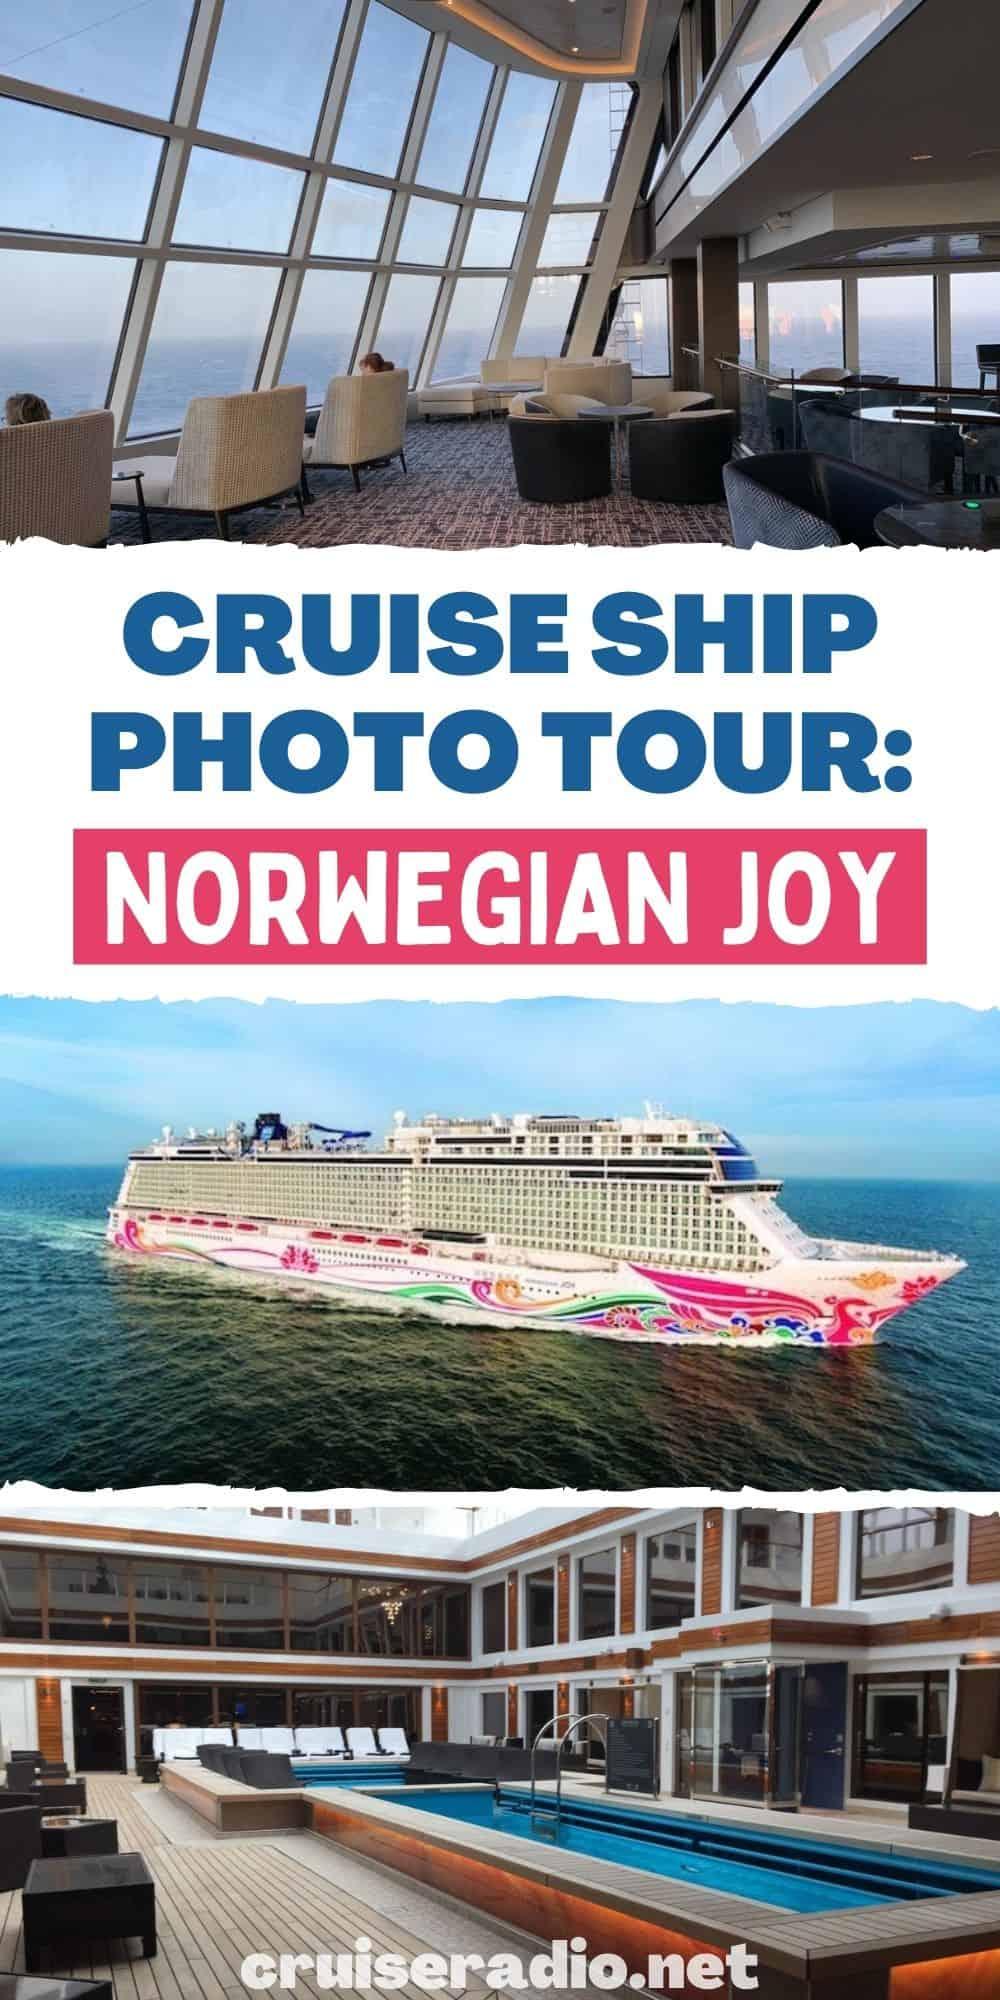 cruise ship photo tour norwegian joy